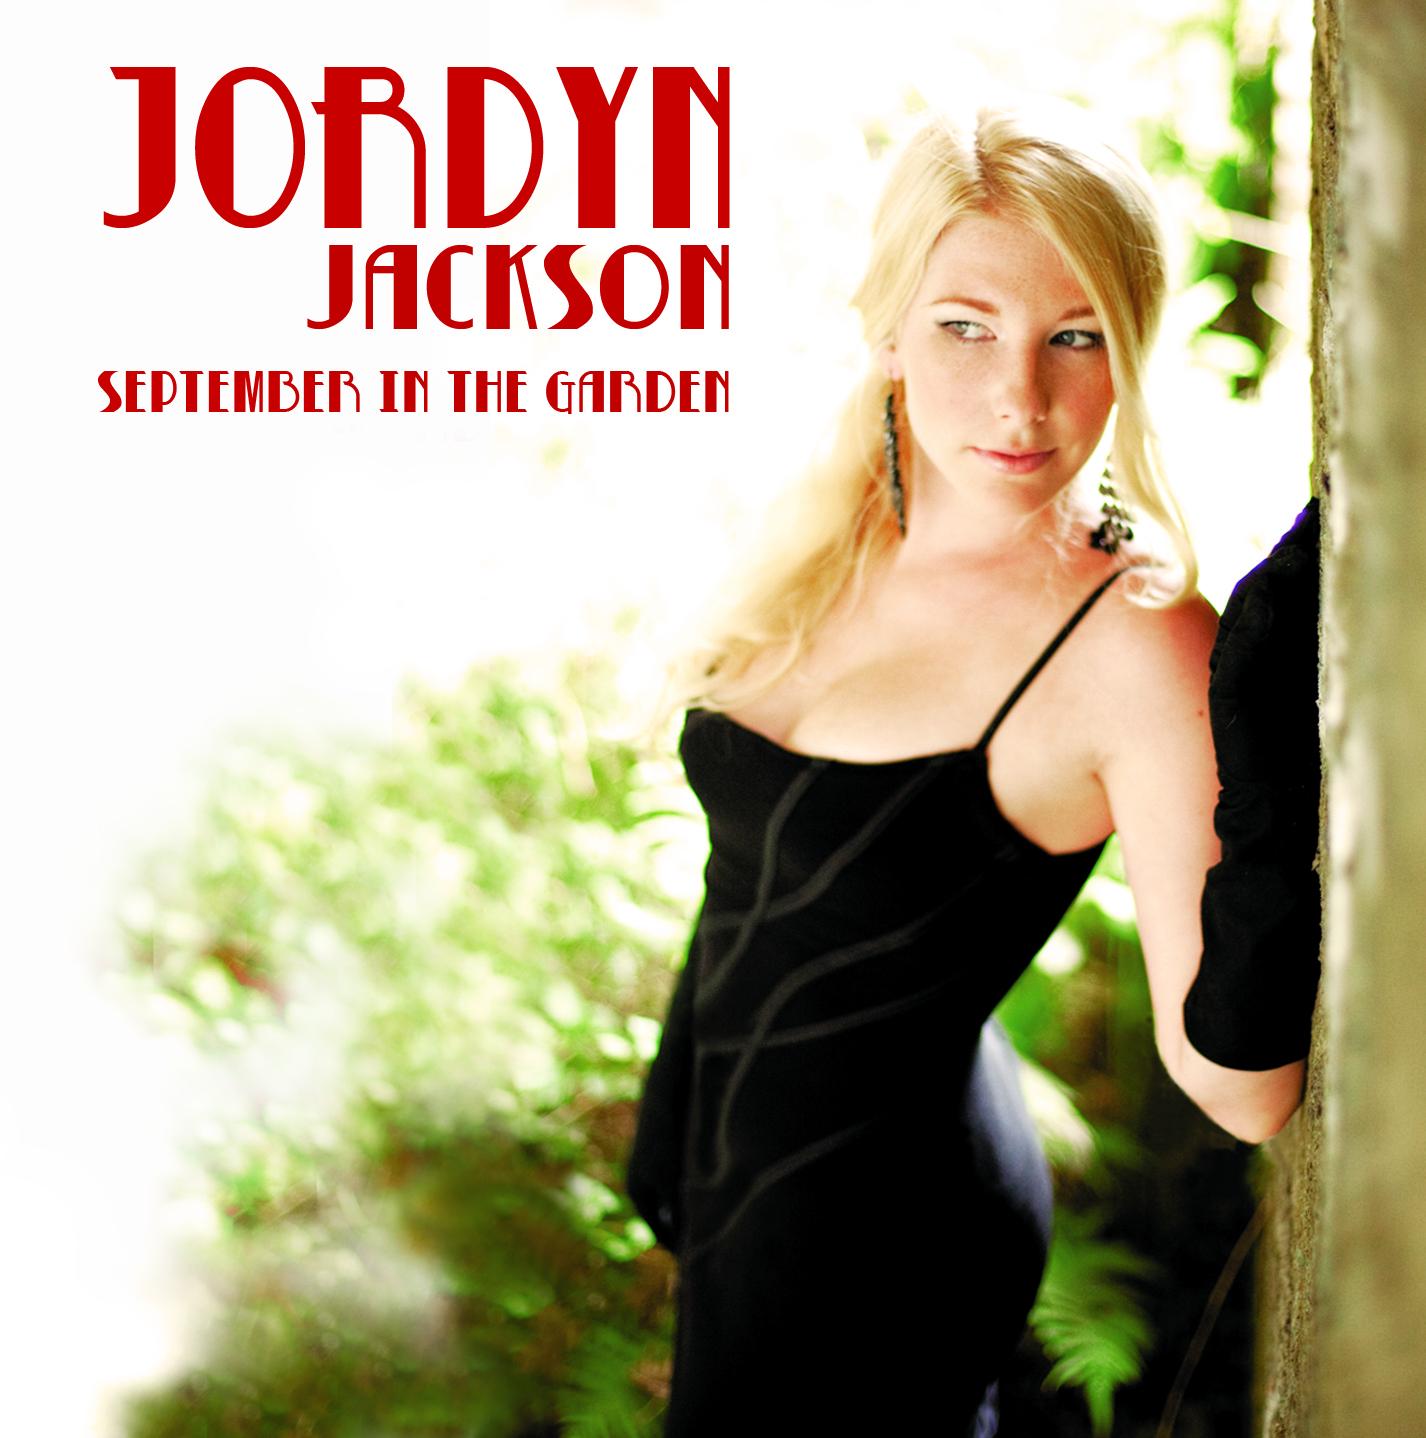 Jordyn Jackson